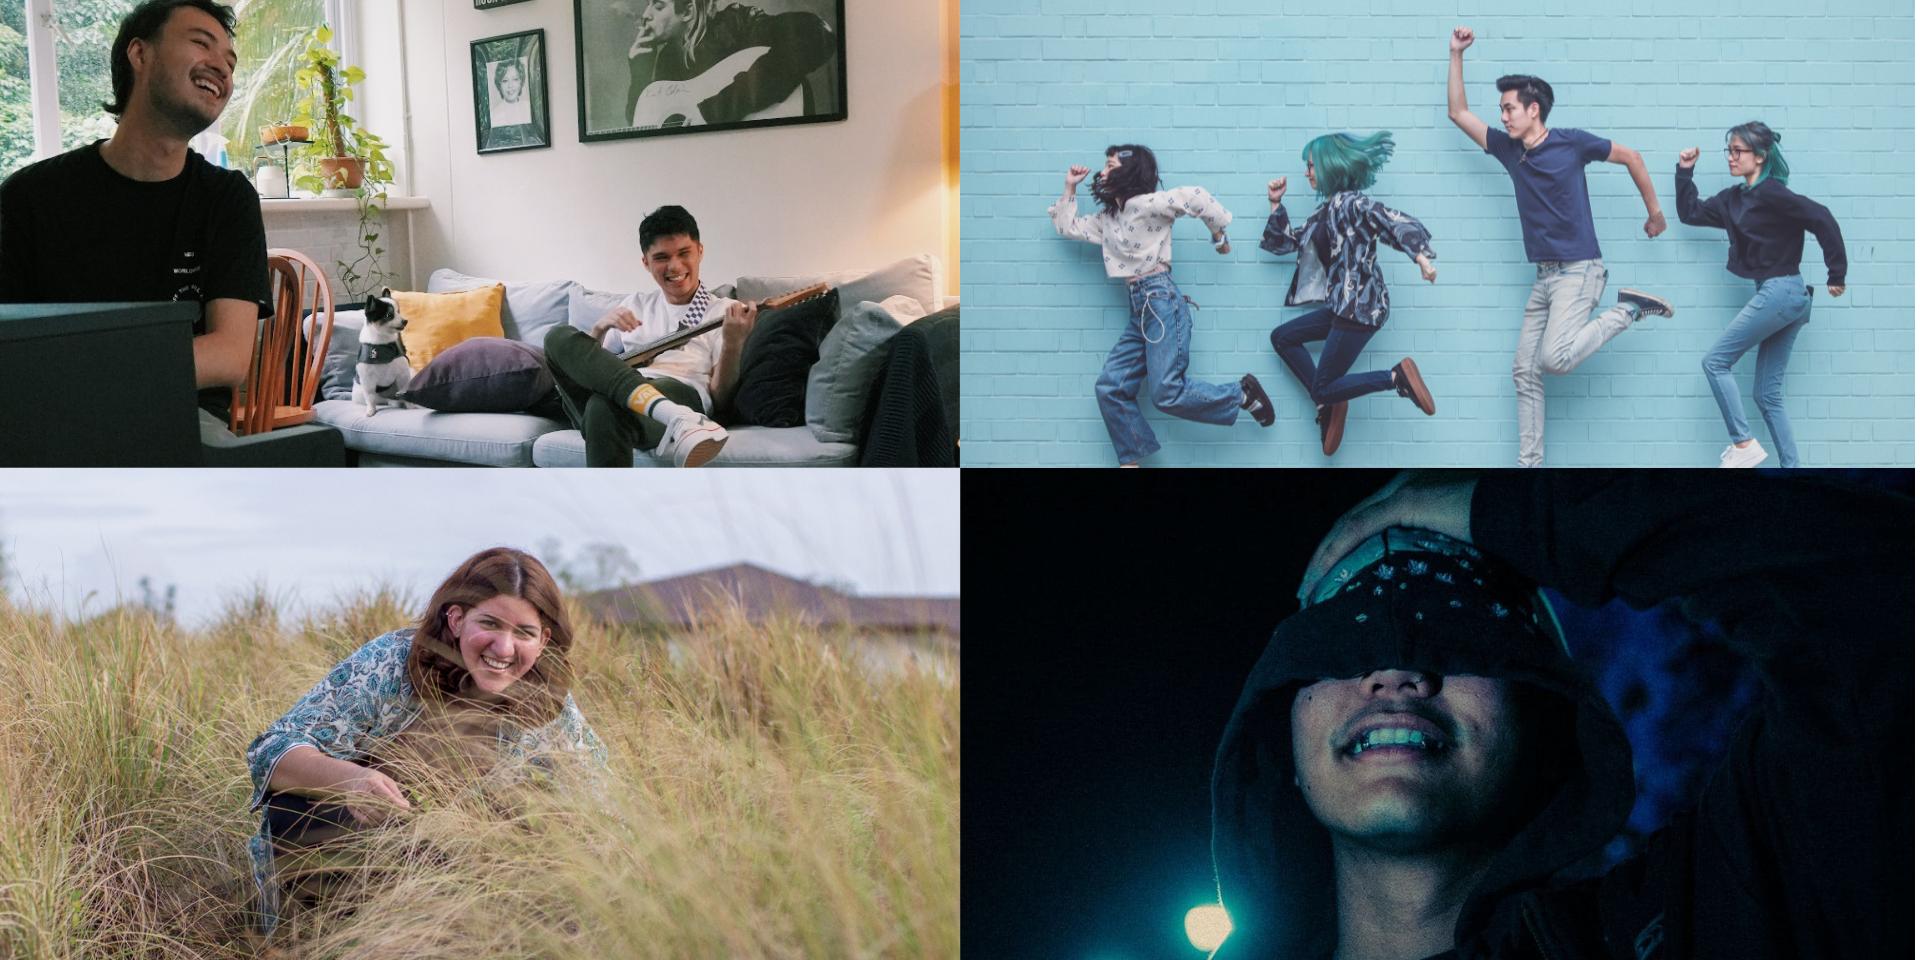 Vans Musicians Wanted 2021 announces Top 20 finalists – cues, Killmeslow, Islandeer, and more